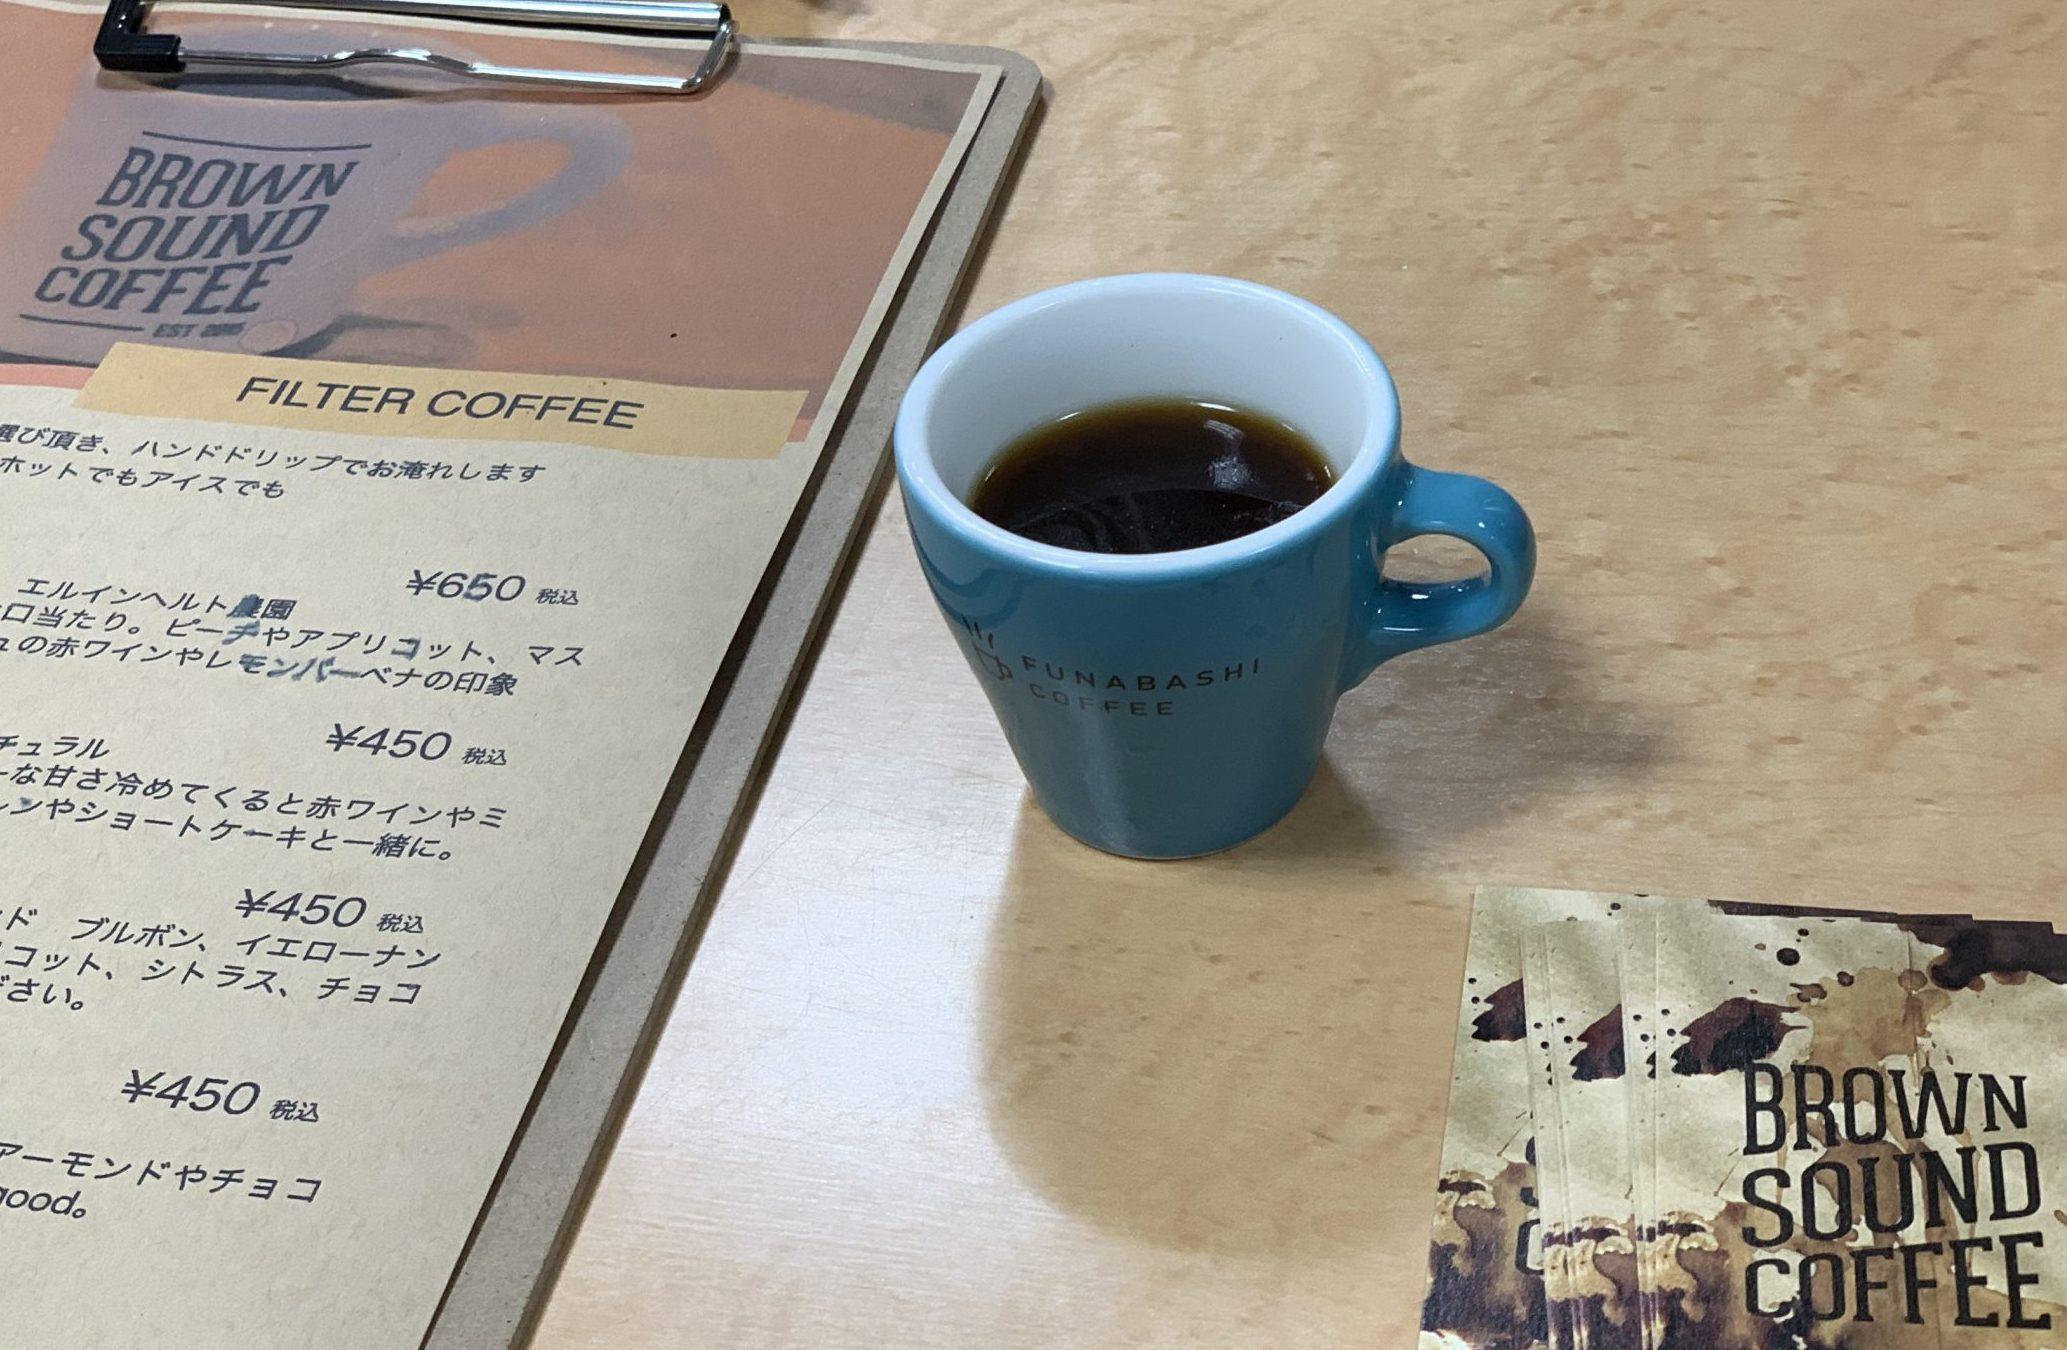 brown sound coffee 船橋コーヒーフェスティバル2019